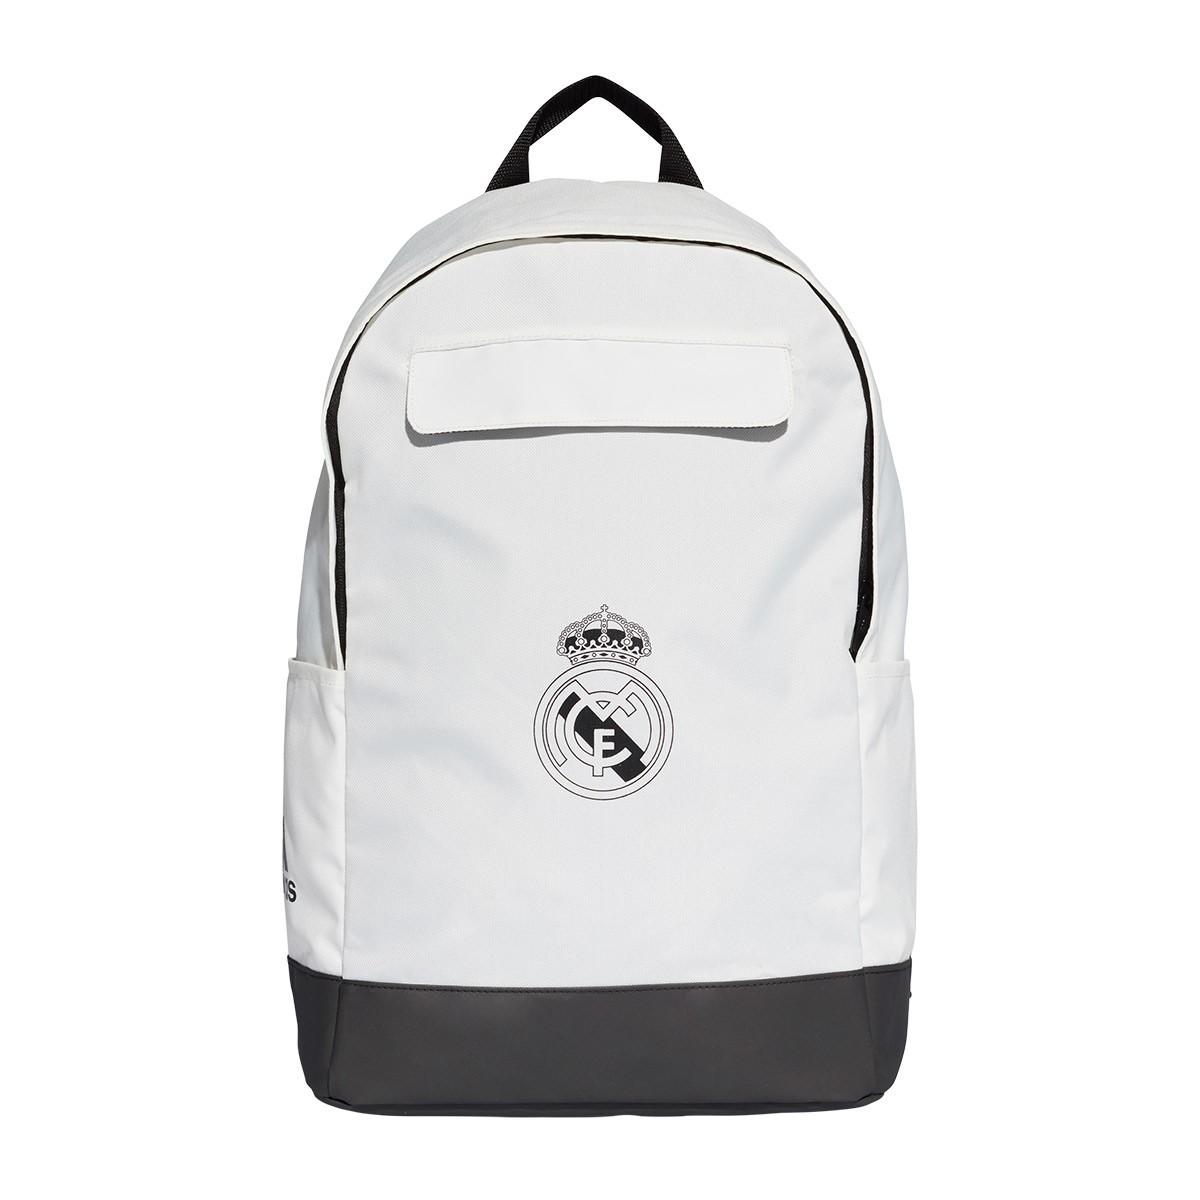 017167f8ee24c Mochila adidas Real Madrid 2018-2019 Core white-Black - Tienda de fútbol  Fútbol Emotion